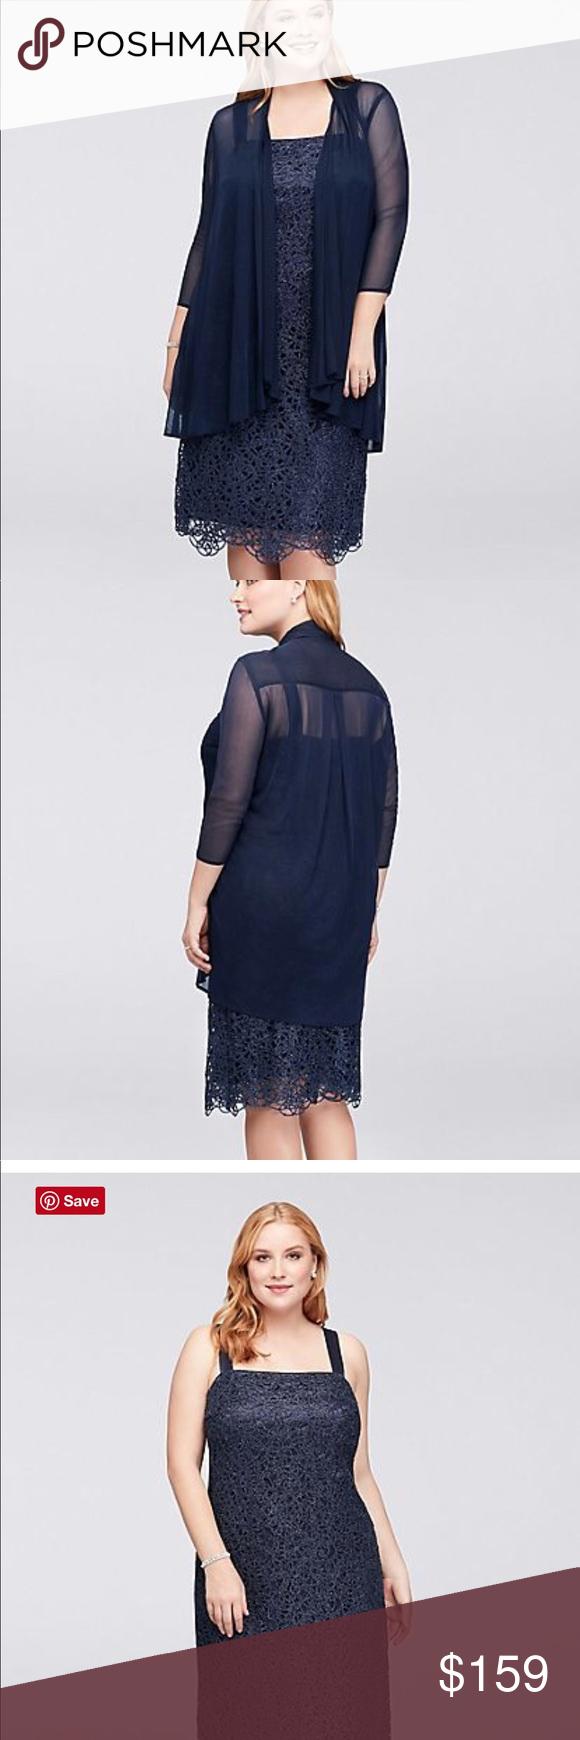 R u m richards navy dress plus size beautiful navy blue beaded dress